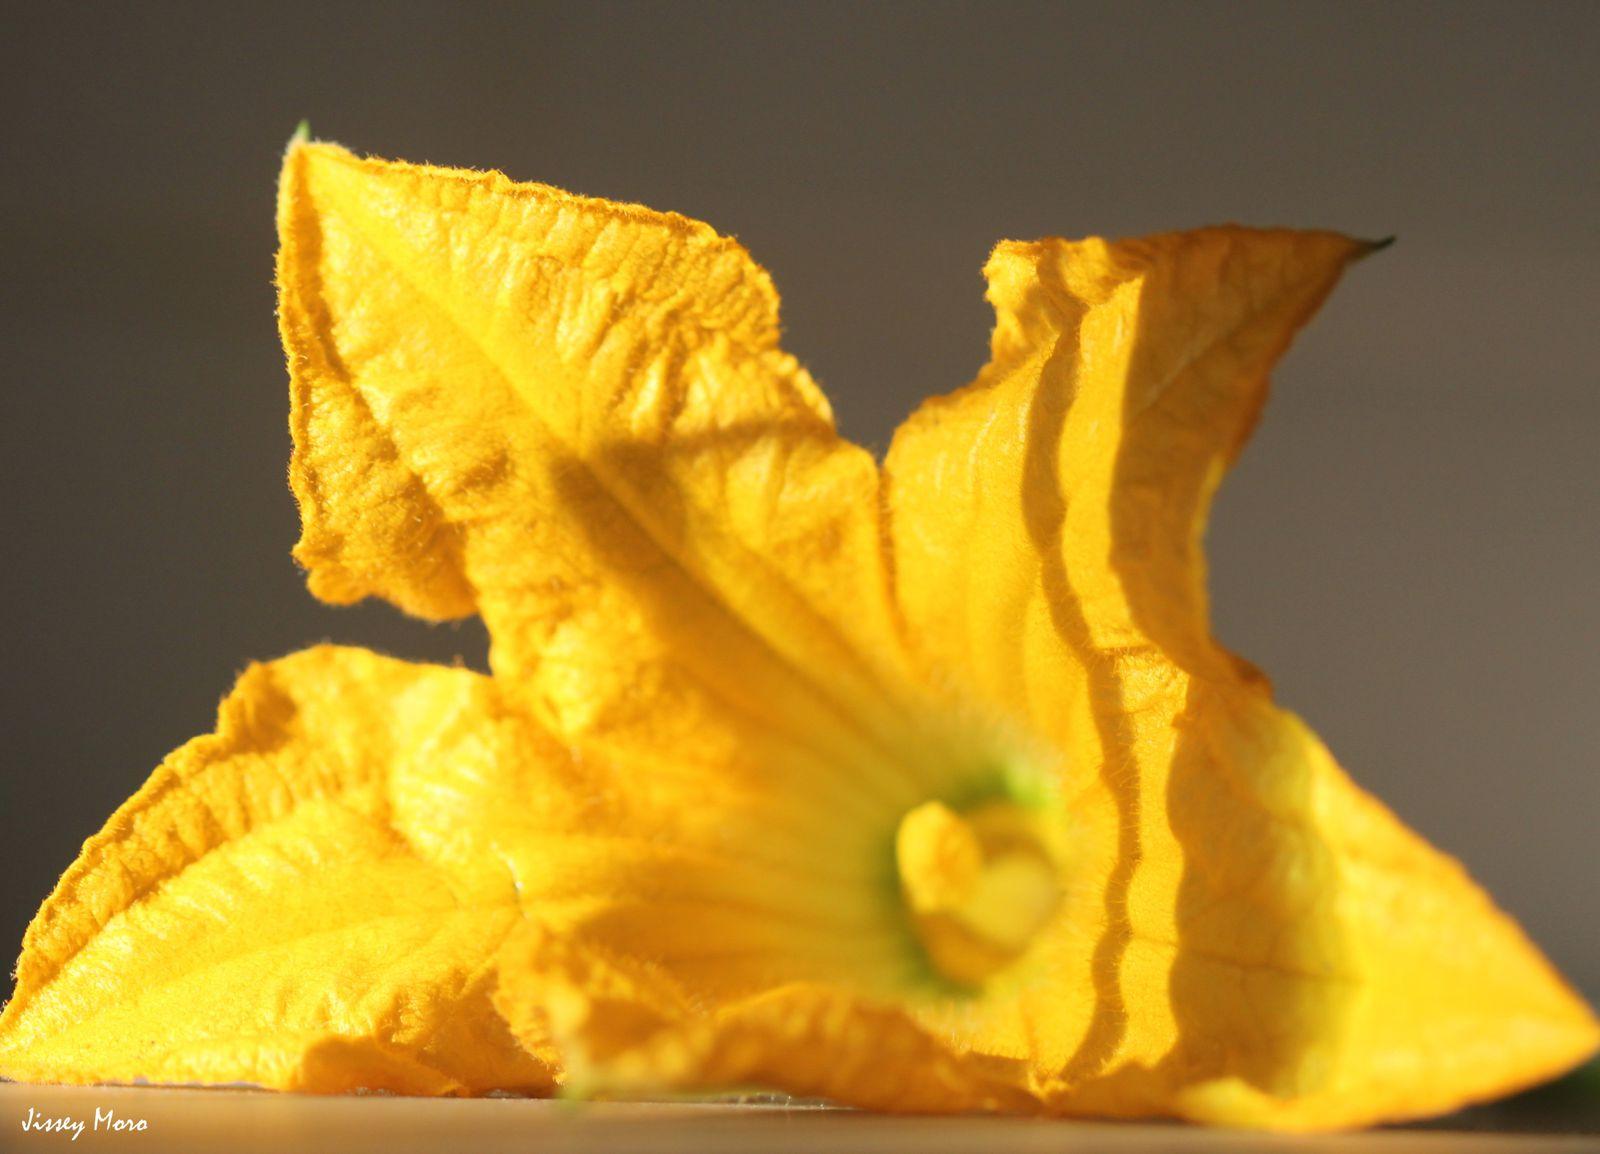 fleurs-en-vrac-5849.JPG